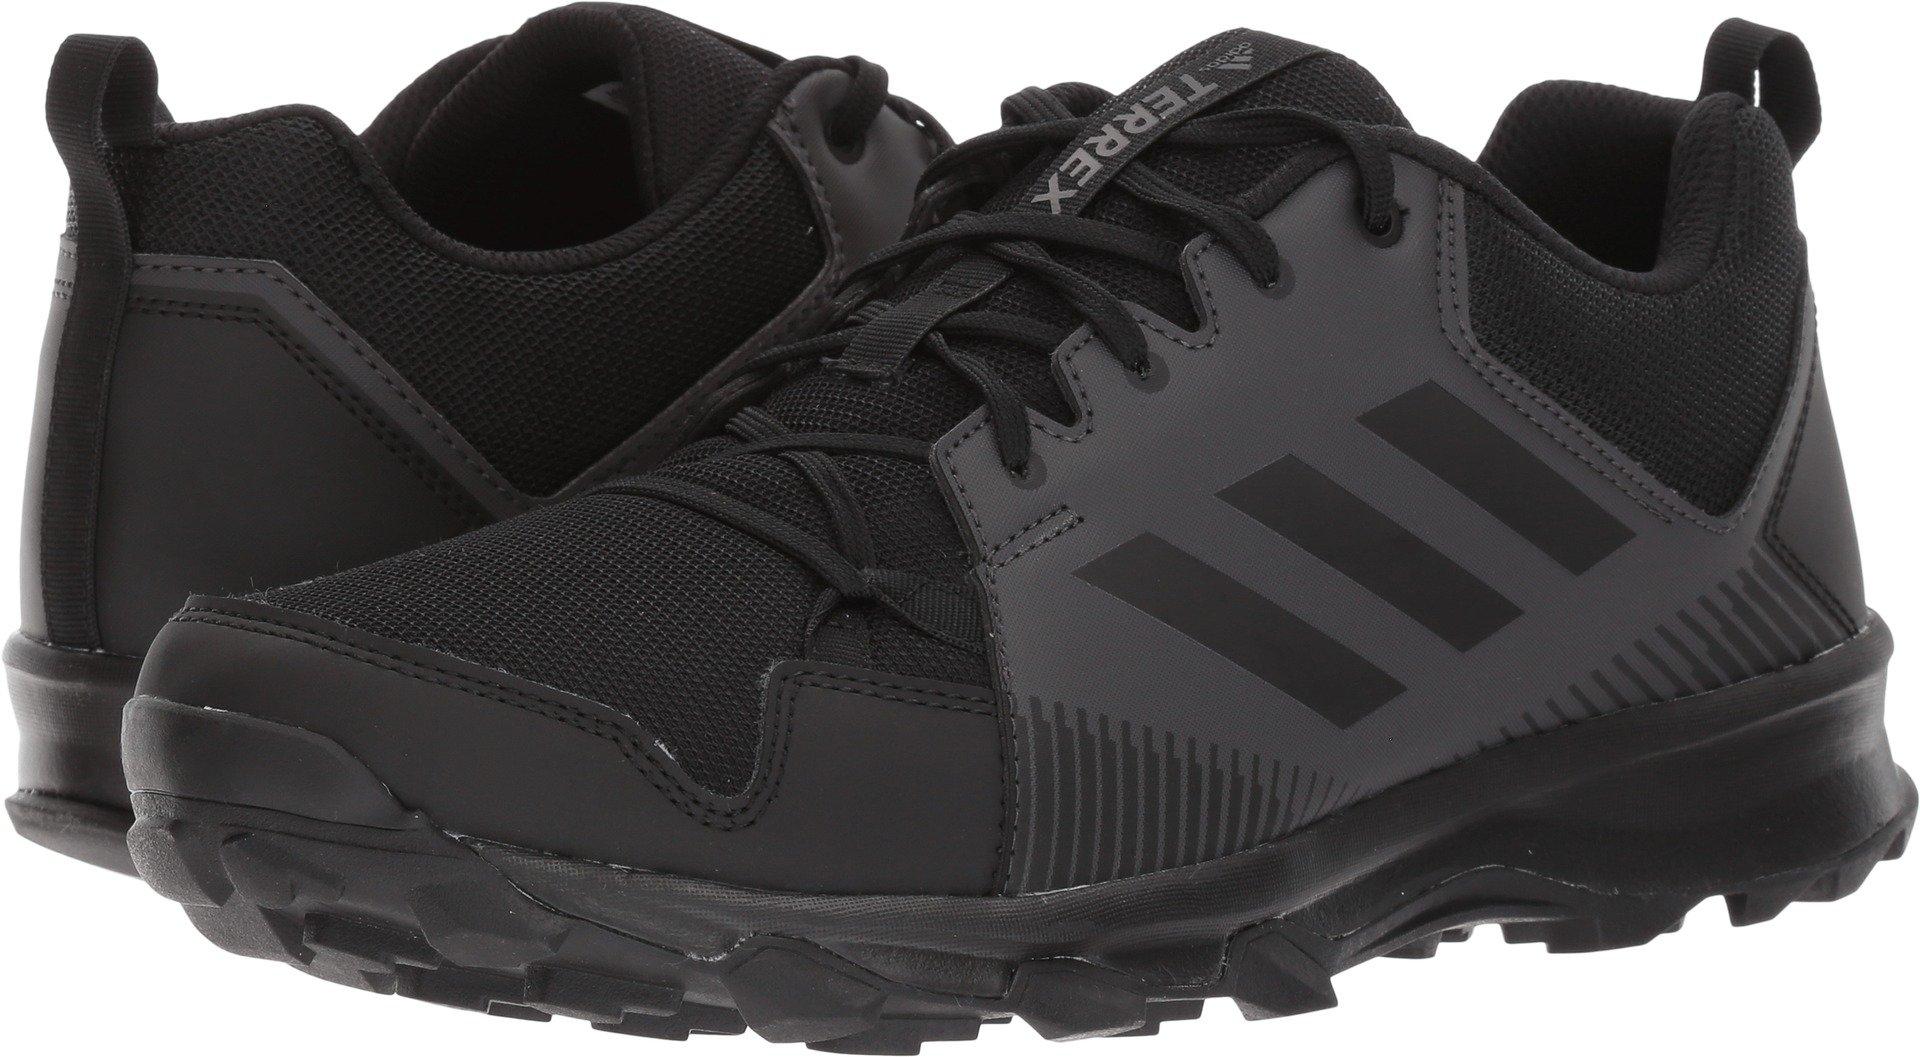 adidas outdoor Men's Terrex Tracerocker Trail Running Shoe, Black/Black/Utility Black, 12 D US